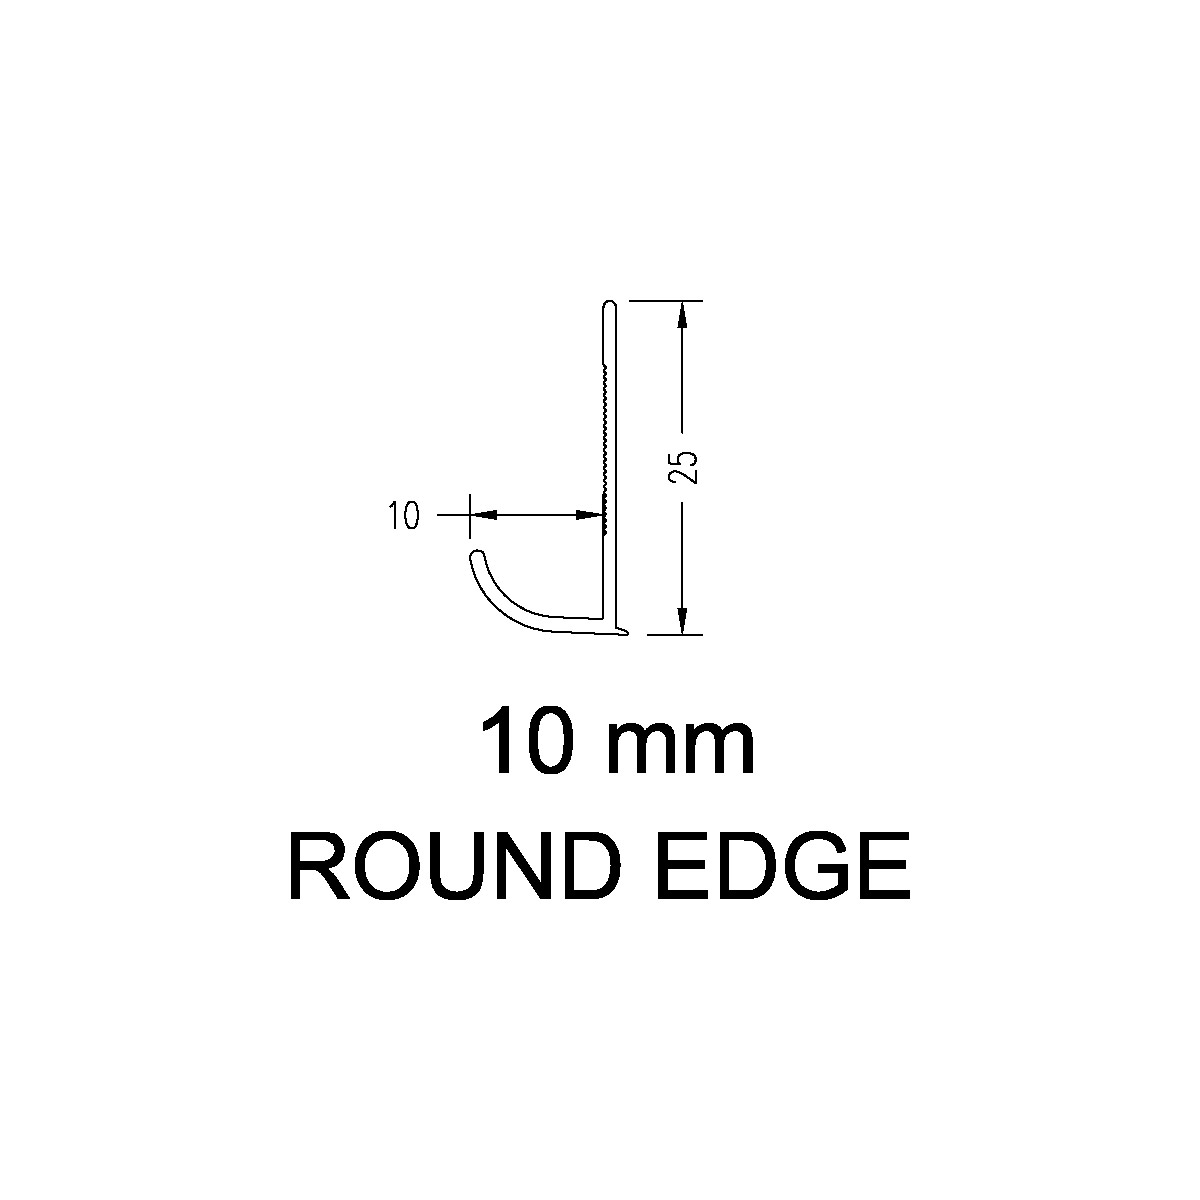 Round Edge – 10mm